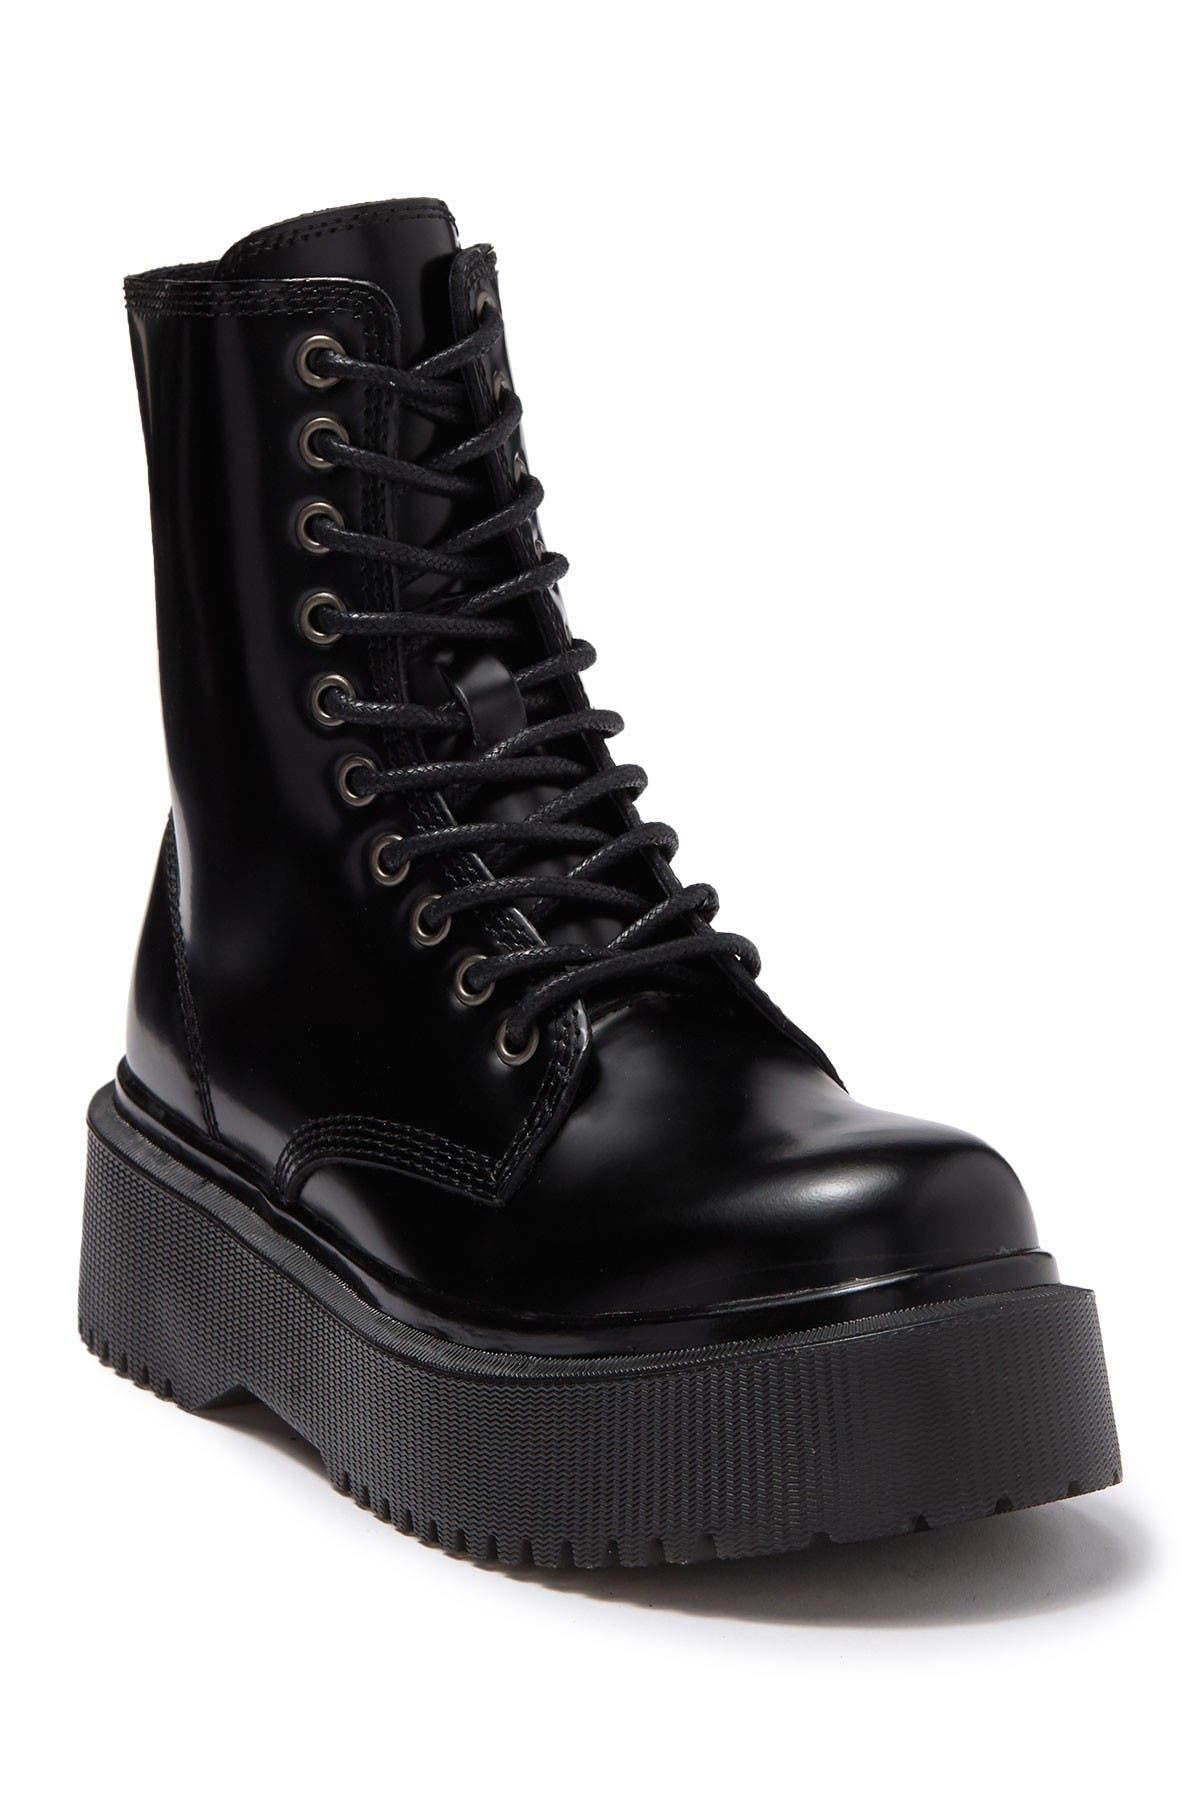 Sopas Leather Lugged Platform Boot